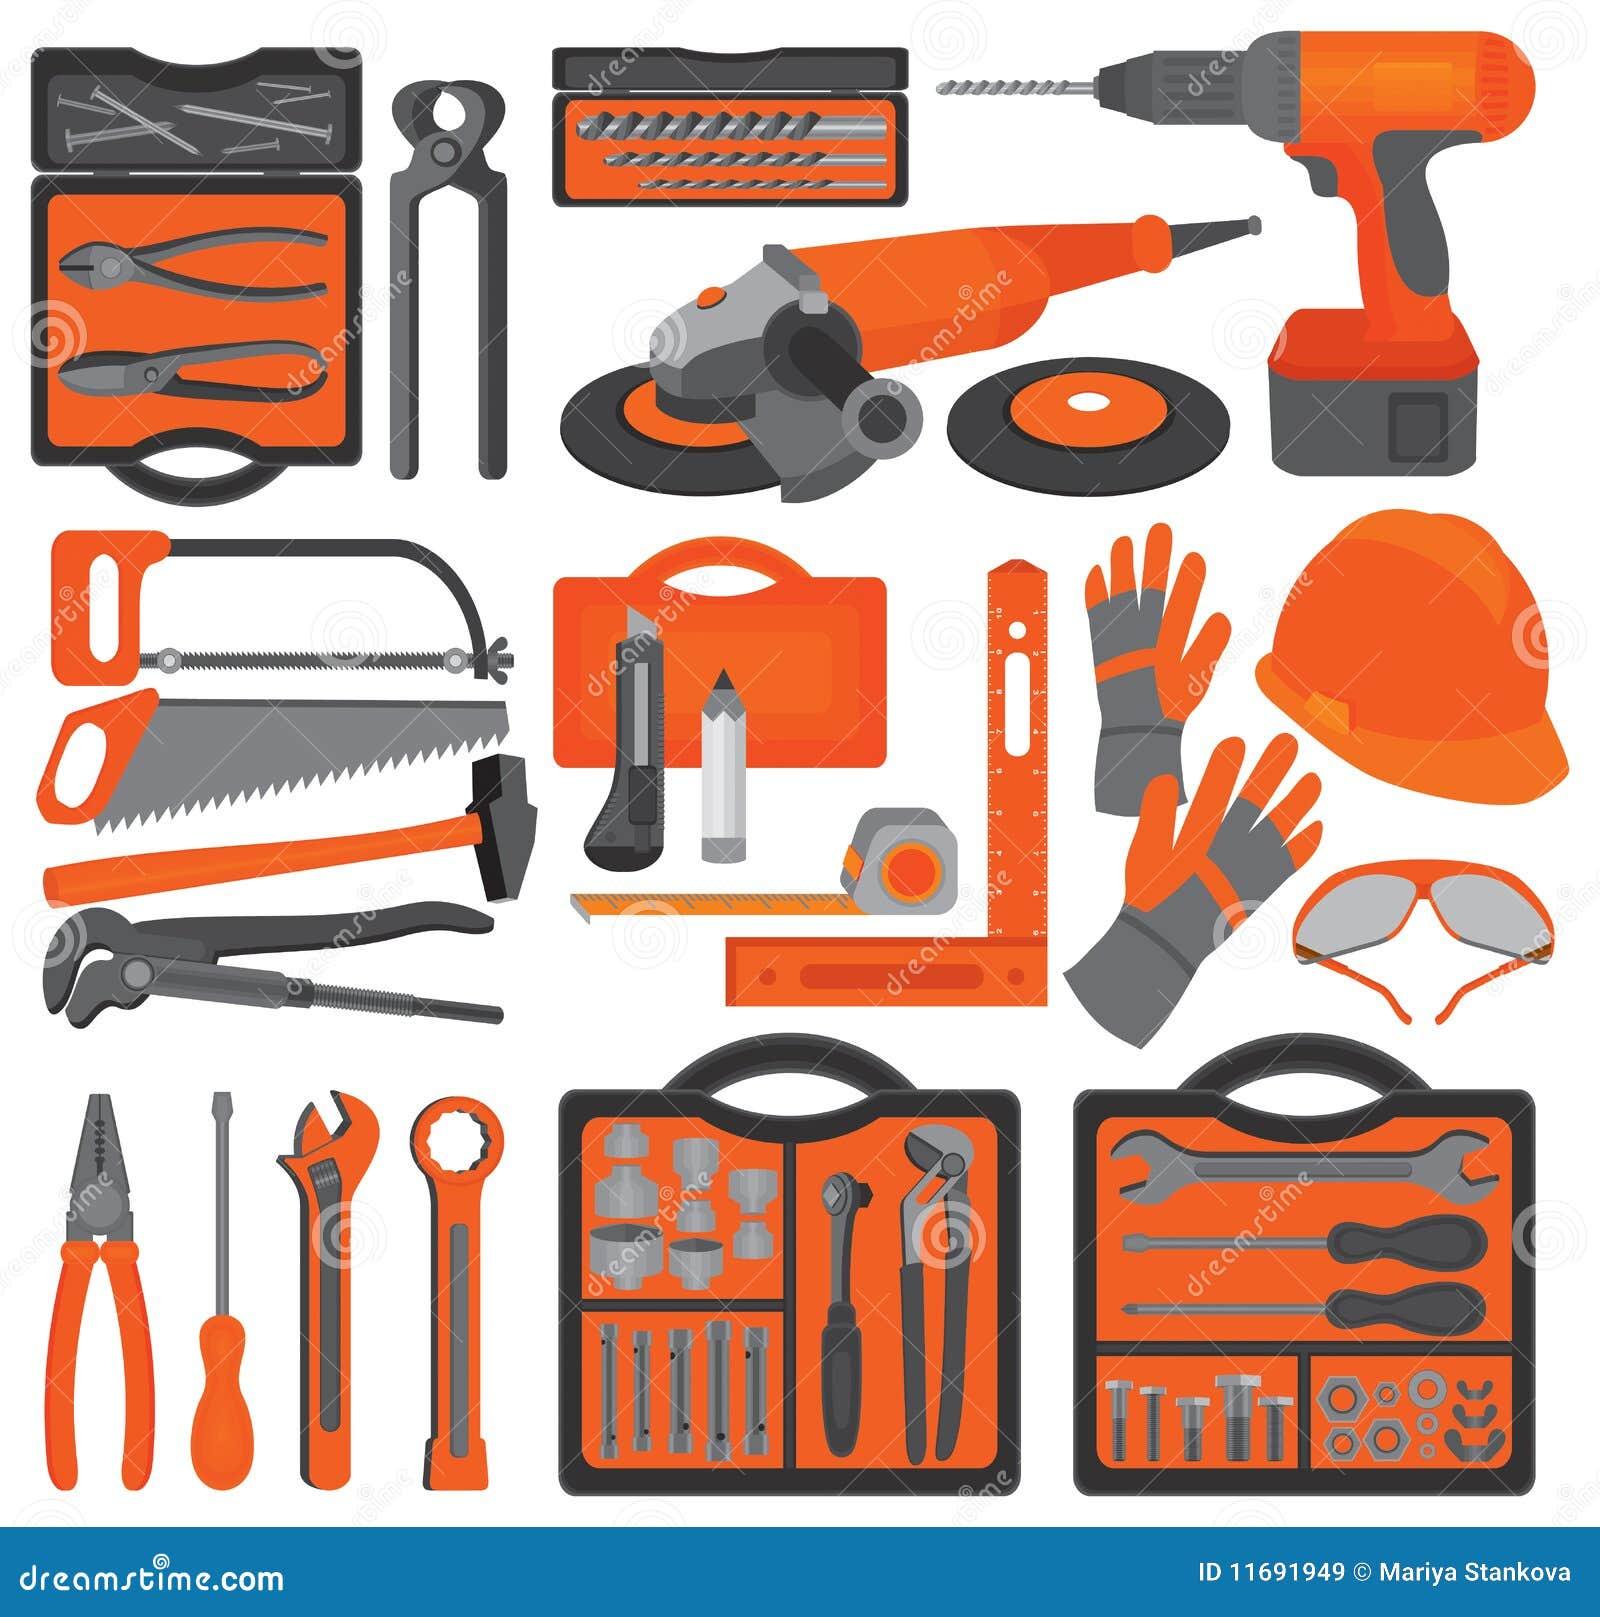 Plumbing Tools Clip Art Free